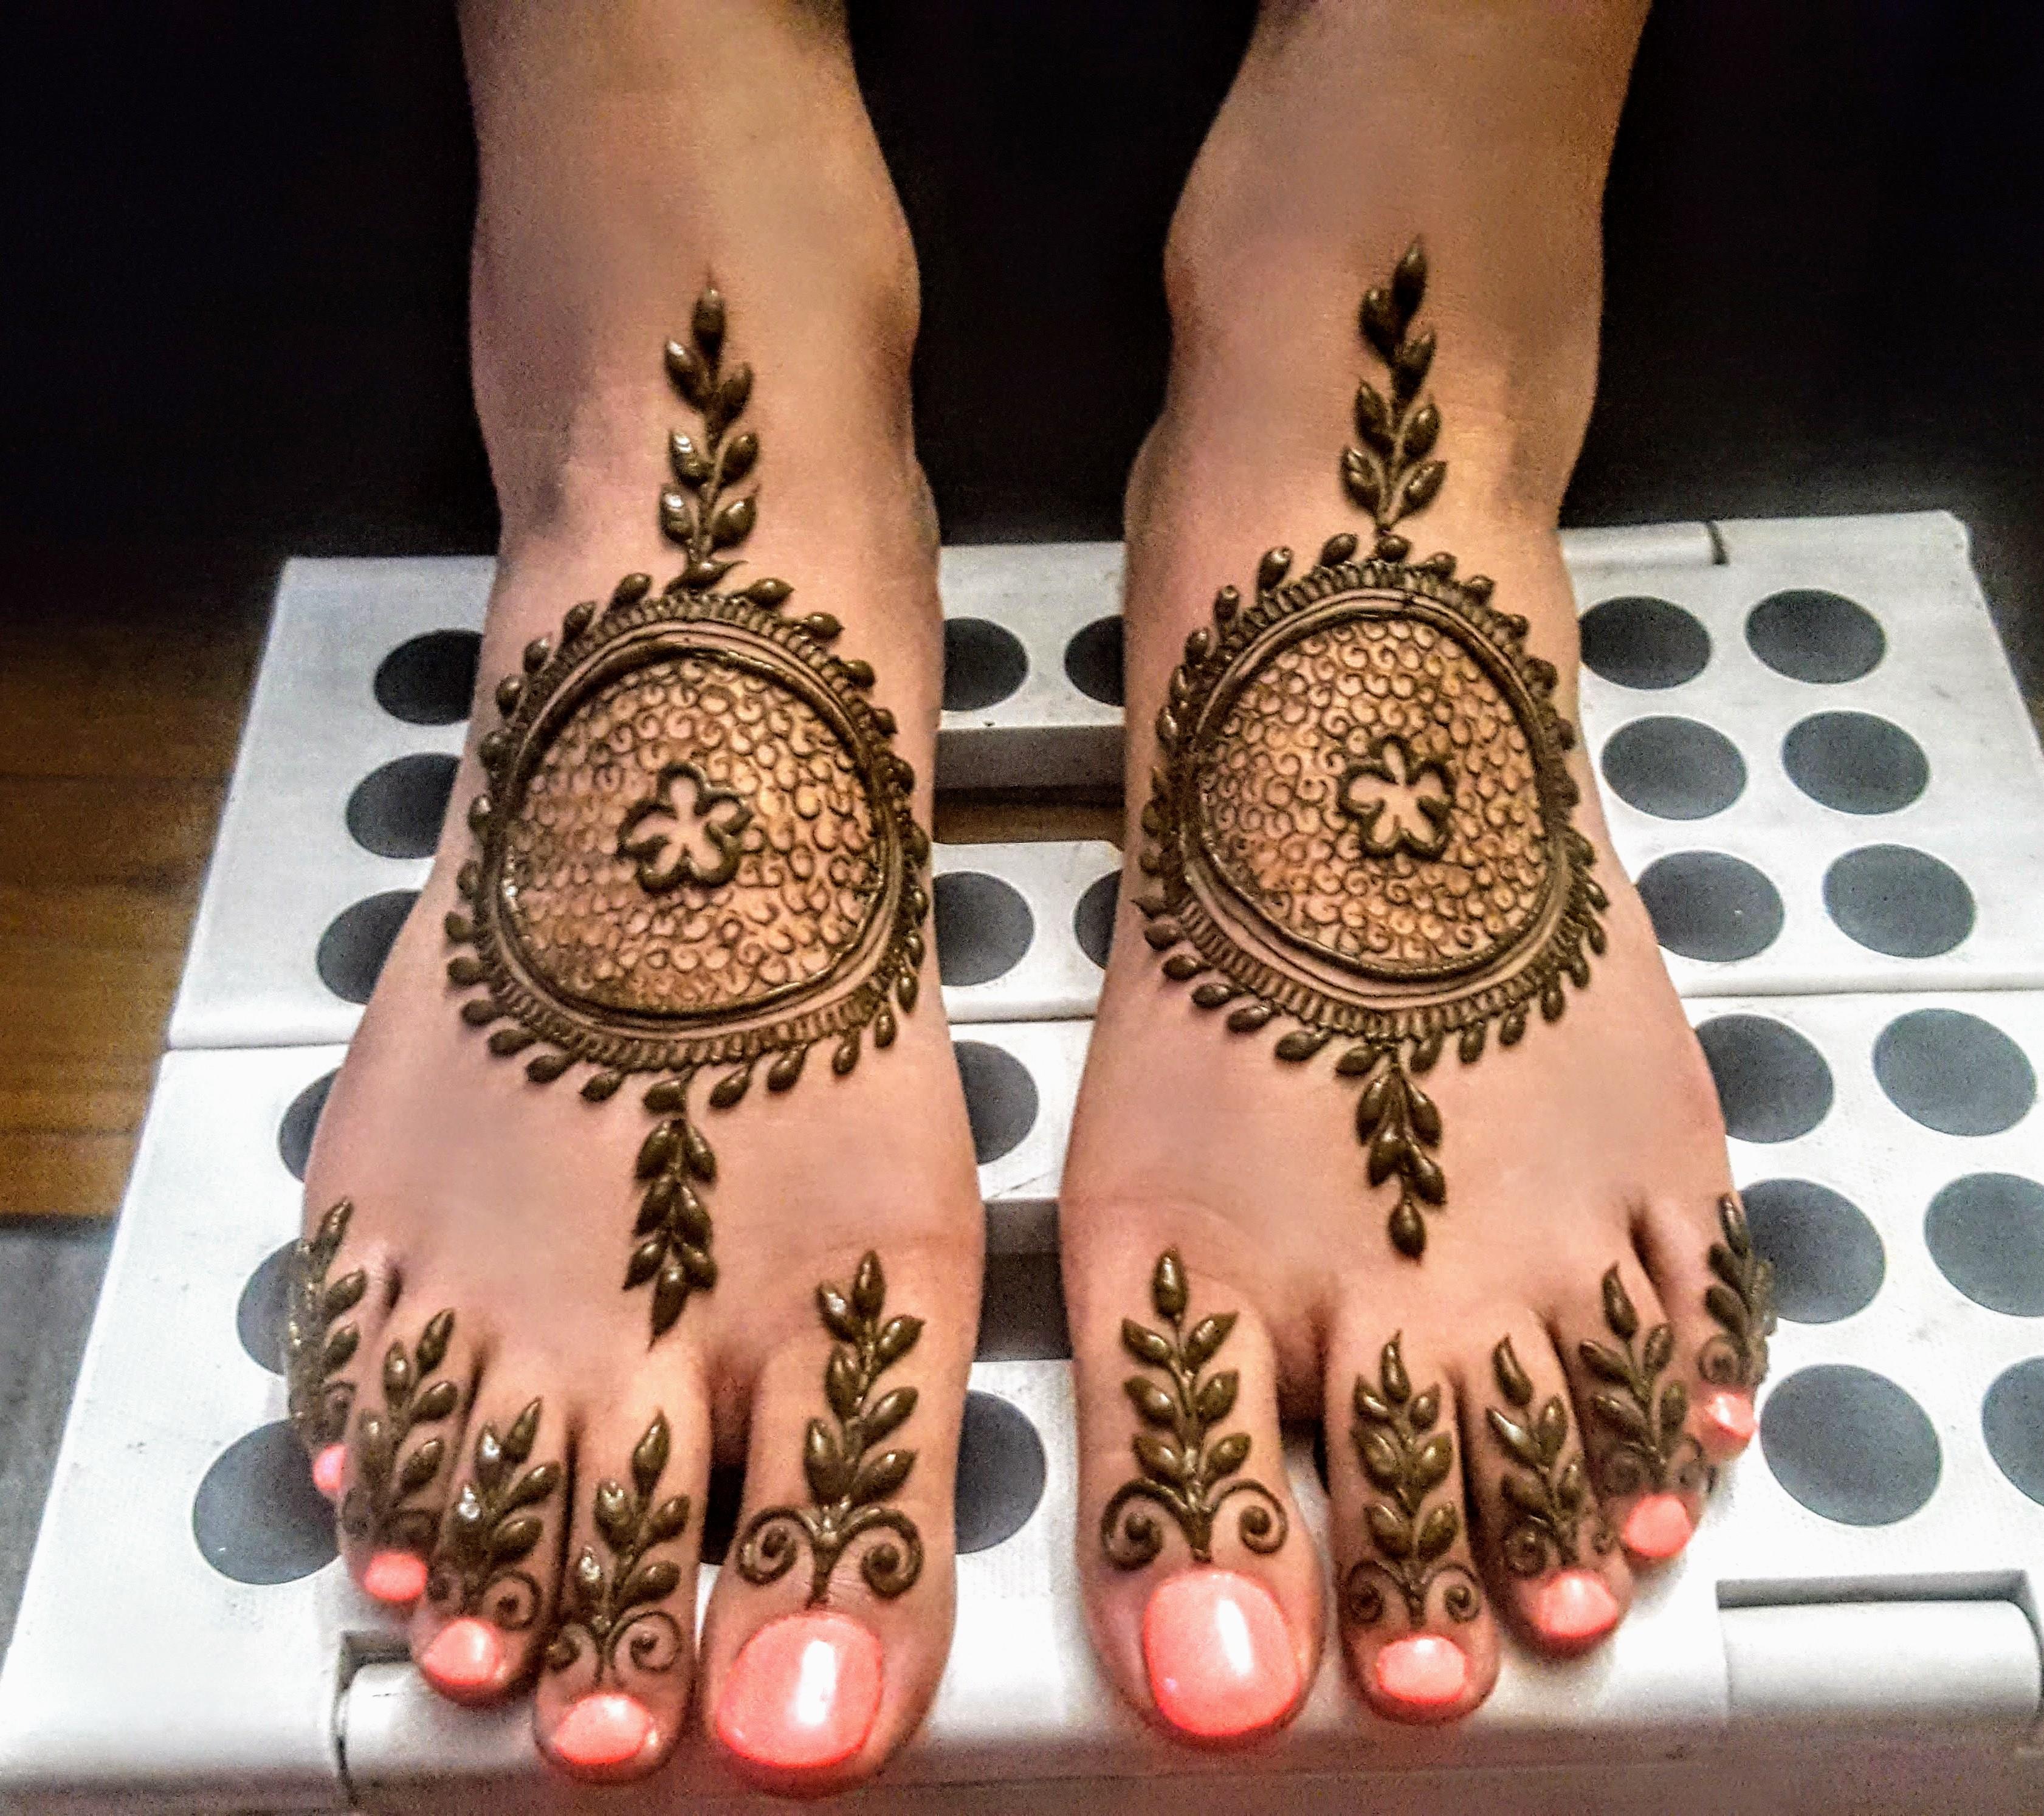 https://0201.nccdn.net/1_2/000/000/0b0/599/Simple-Feet.jpg